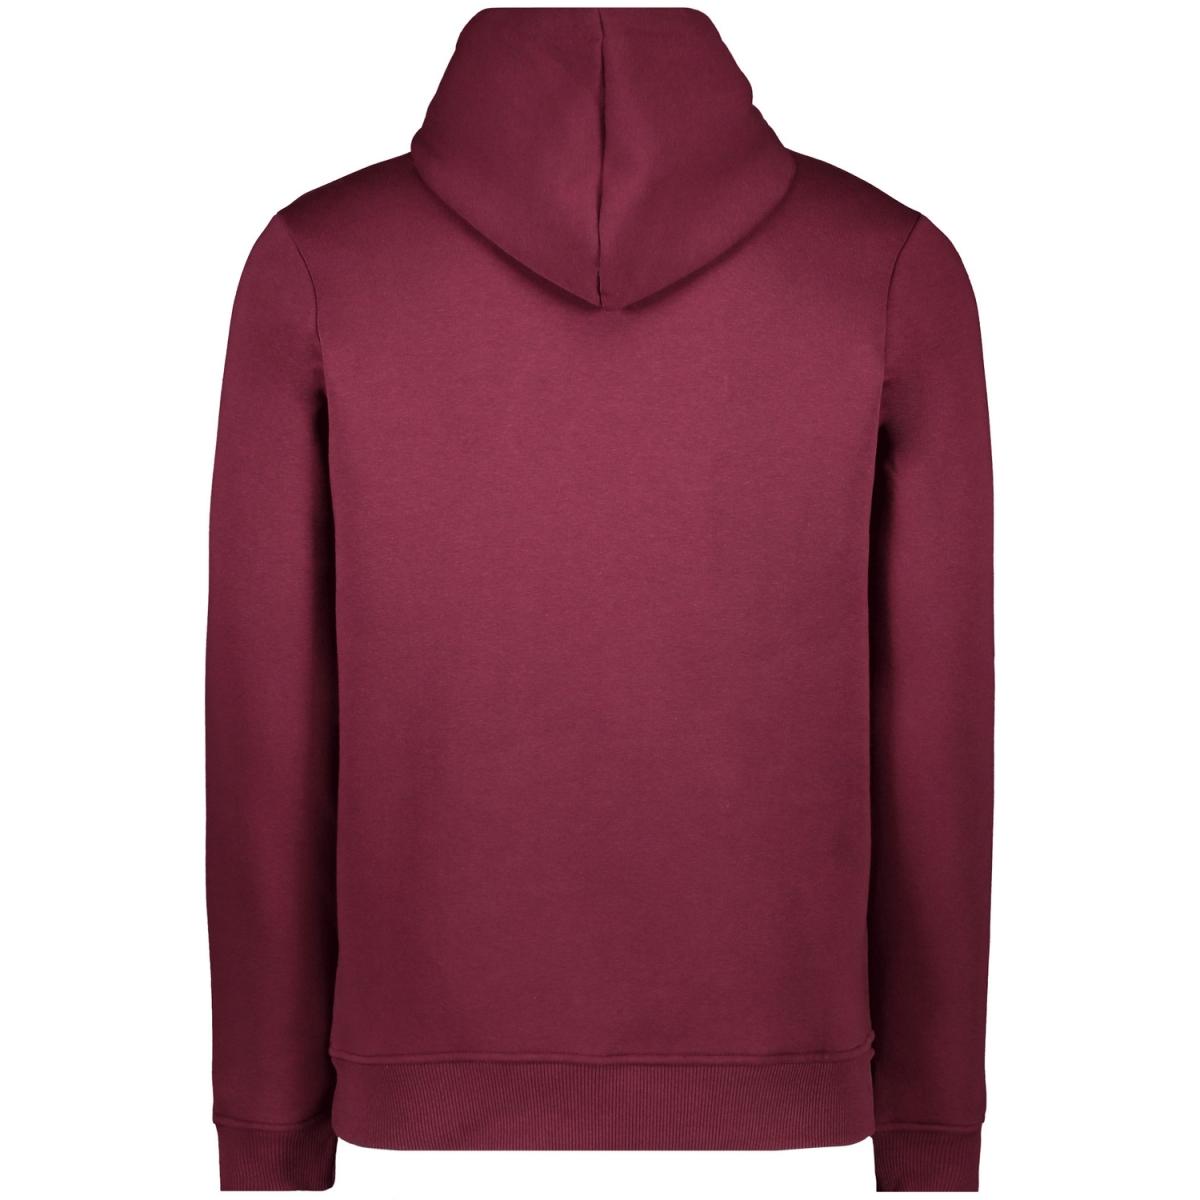 kimar hood sw 40379 cars sweater 58 bordeaux